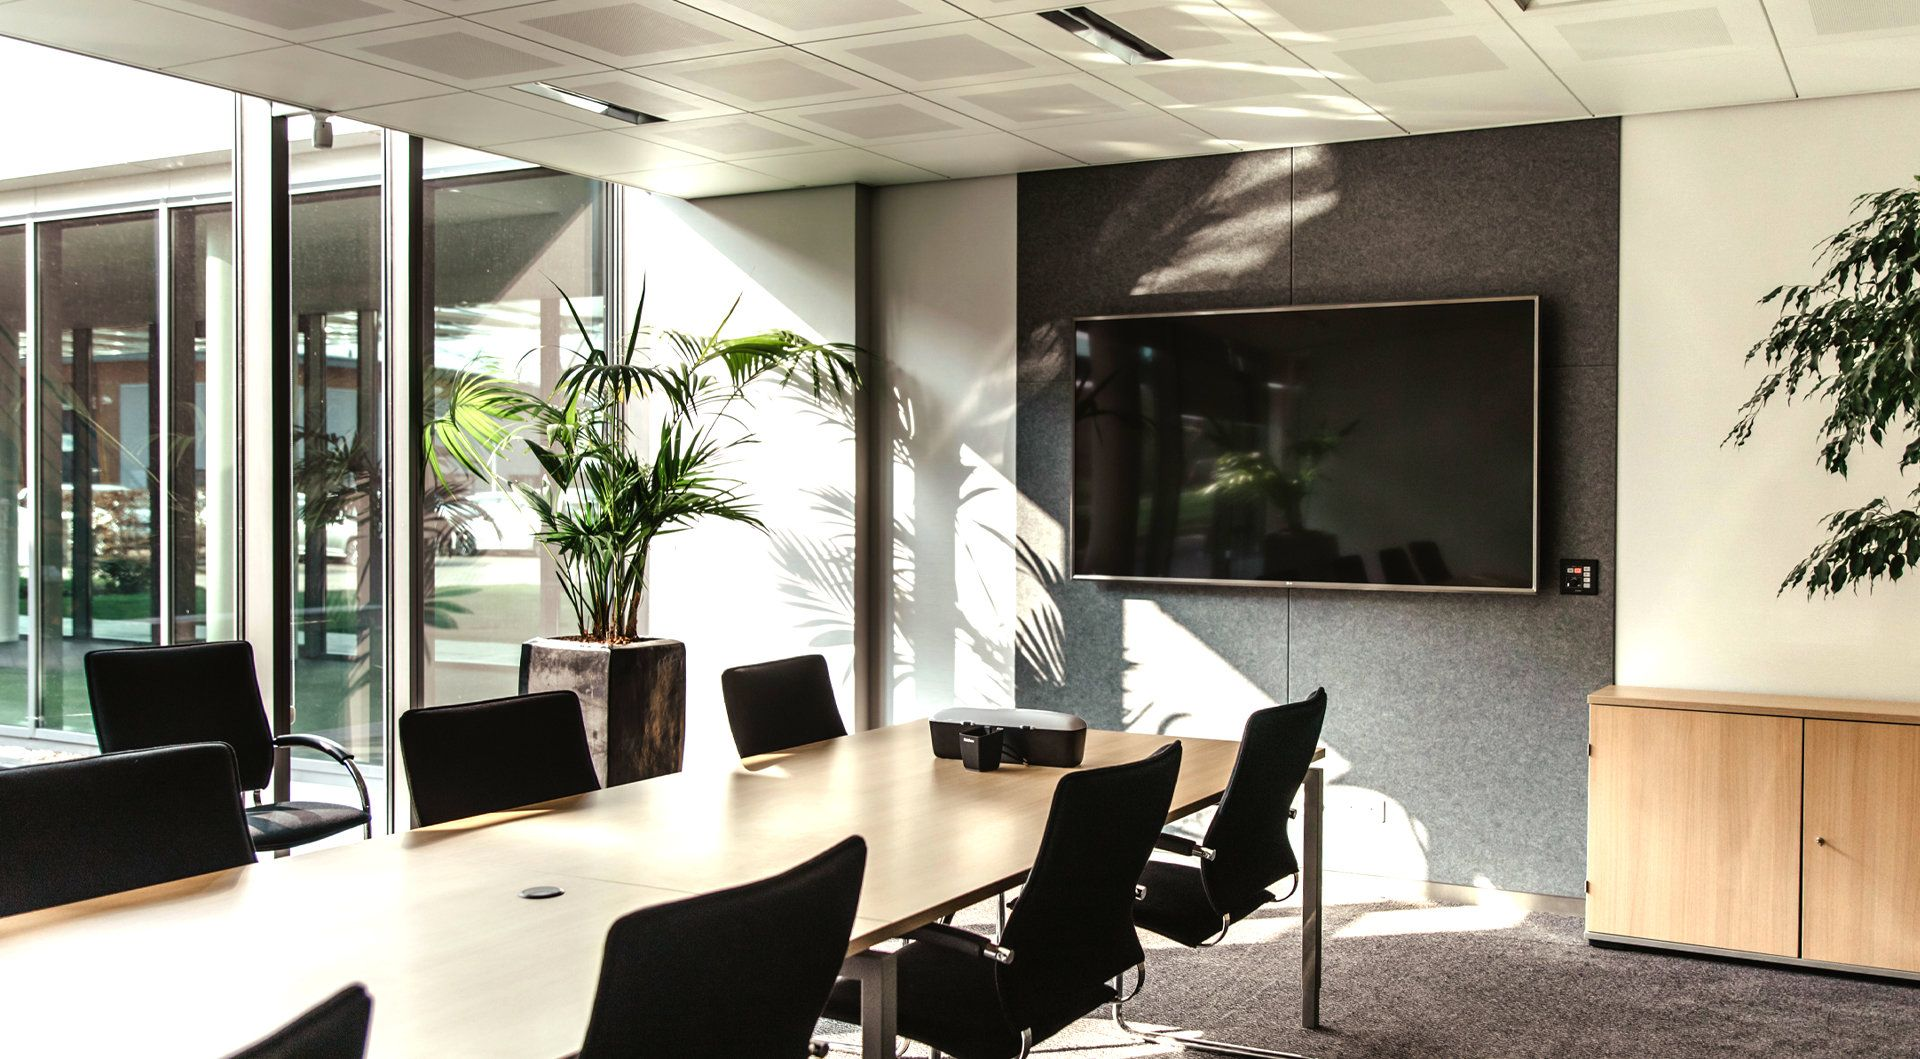 "LG 55SM5KE beeldkrant 139,7 cm (55"") LCD Full HD Digitale signage flatscreen Zwart - Case studie de vries"